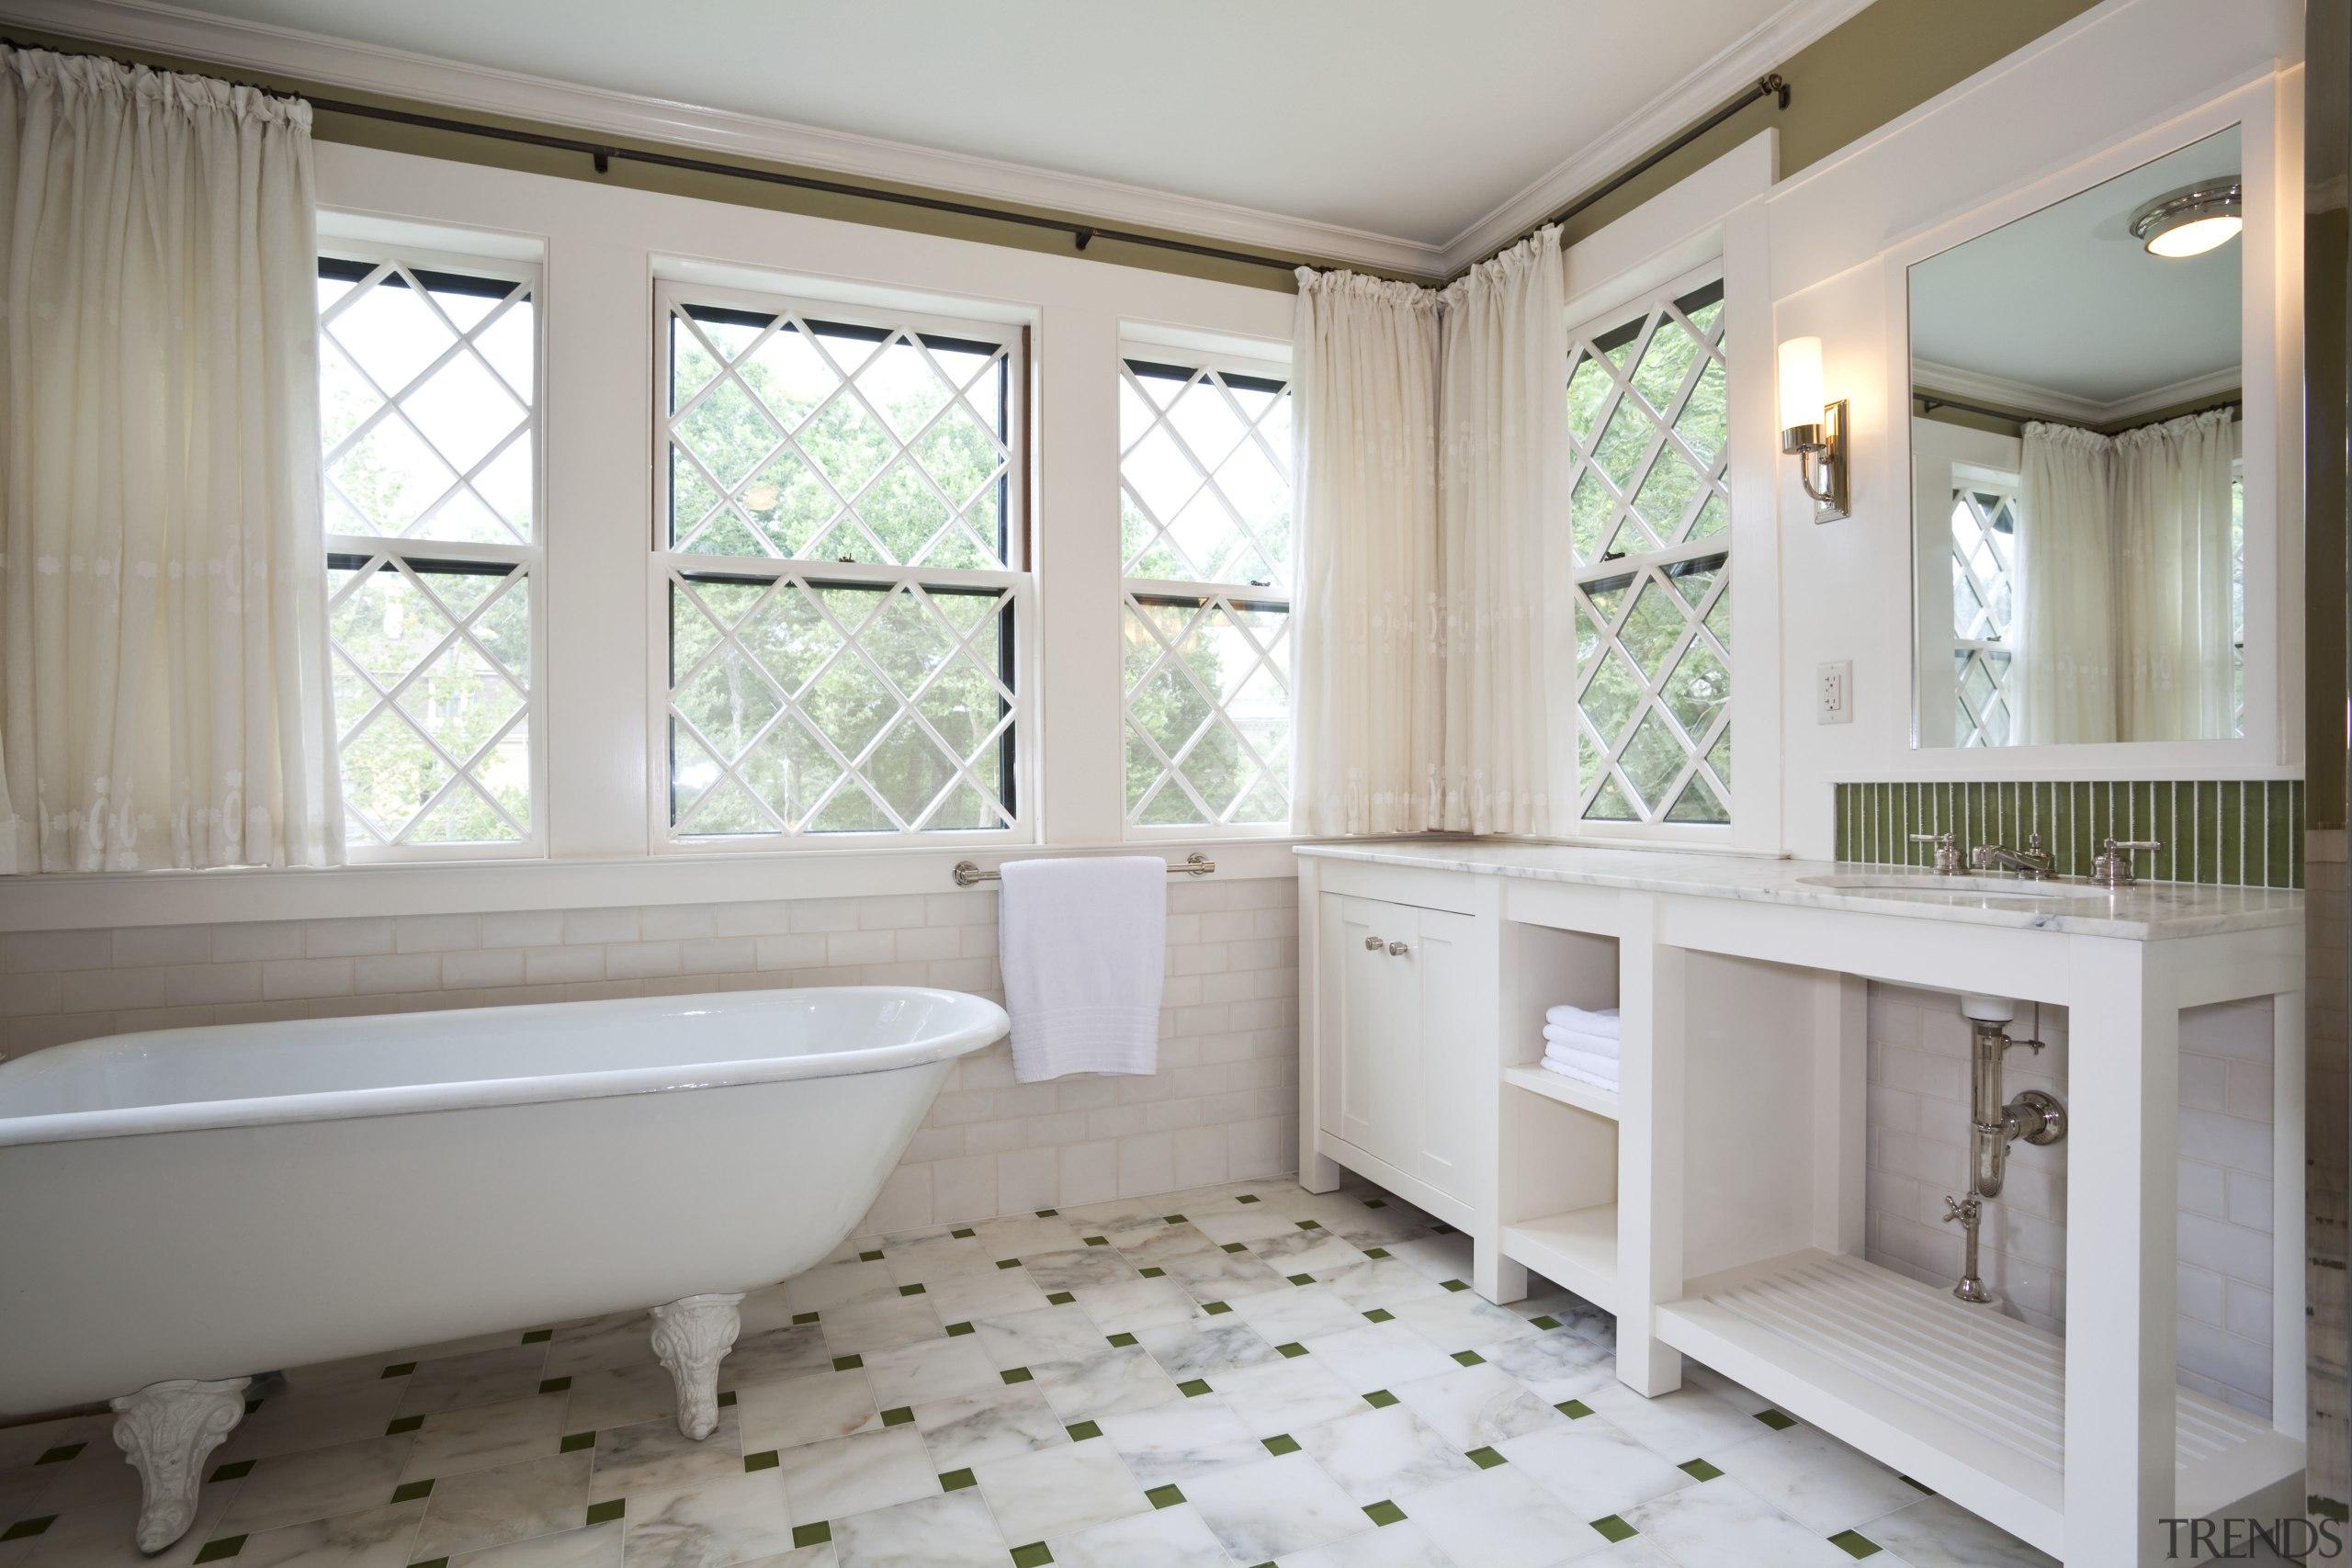 View of home in the historic Brattle Street bathroom, bathtub, estate, floor, flooring, home, interior design, plumbing fixture, property, real estate, room, tile, window, gray